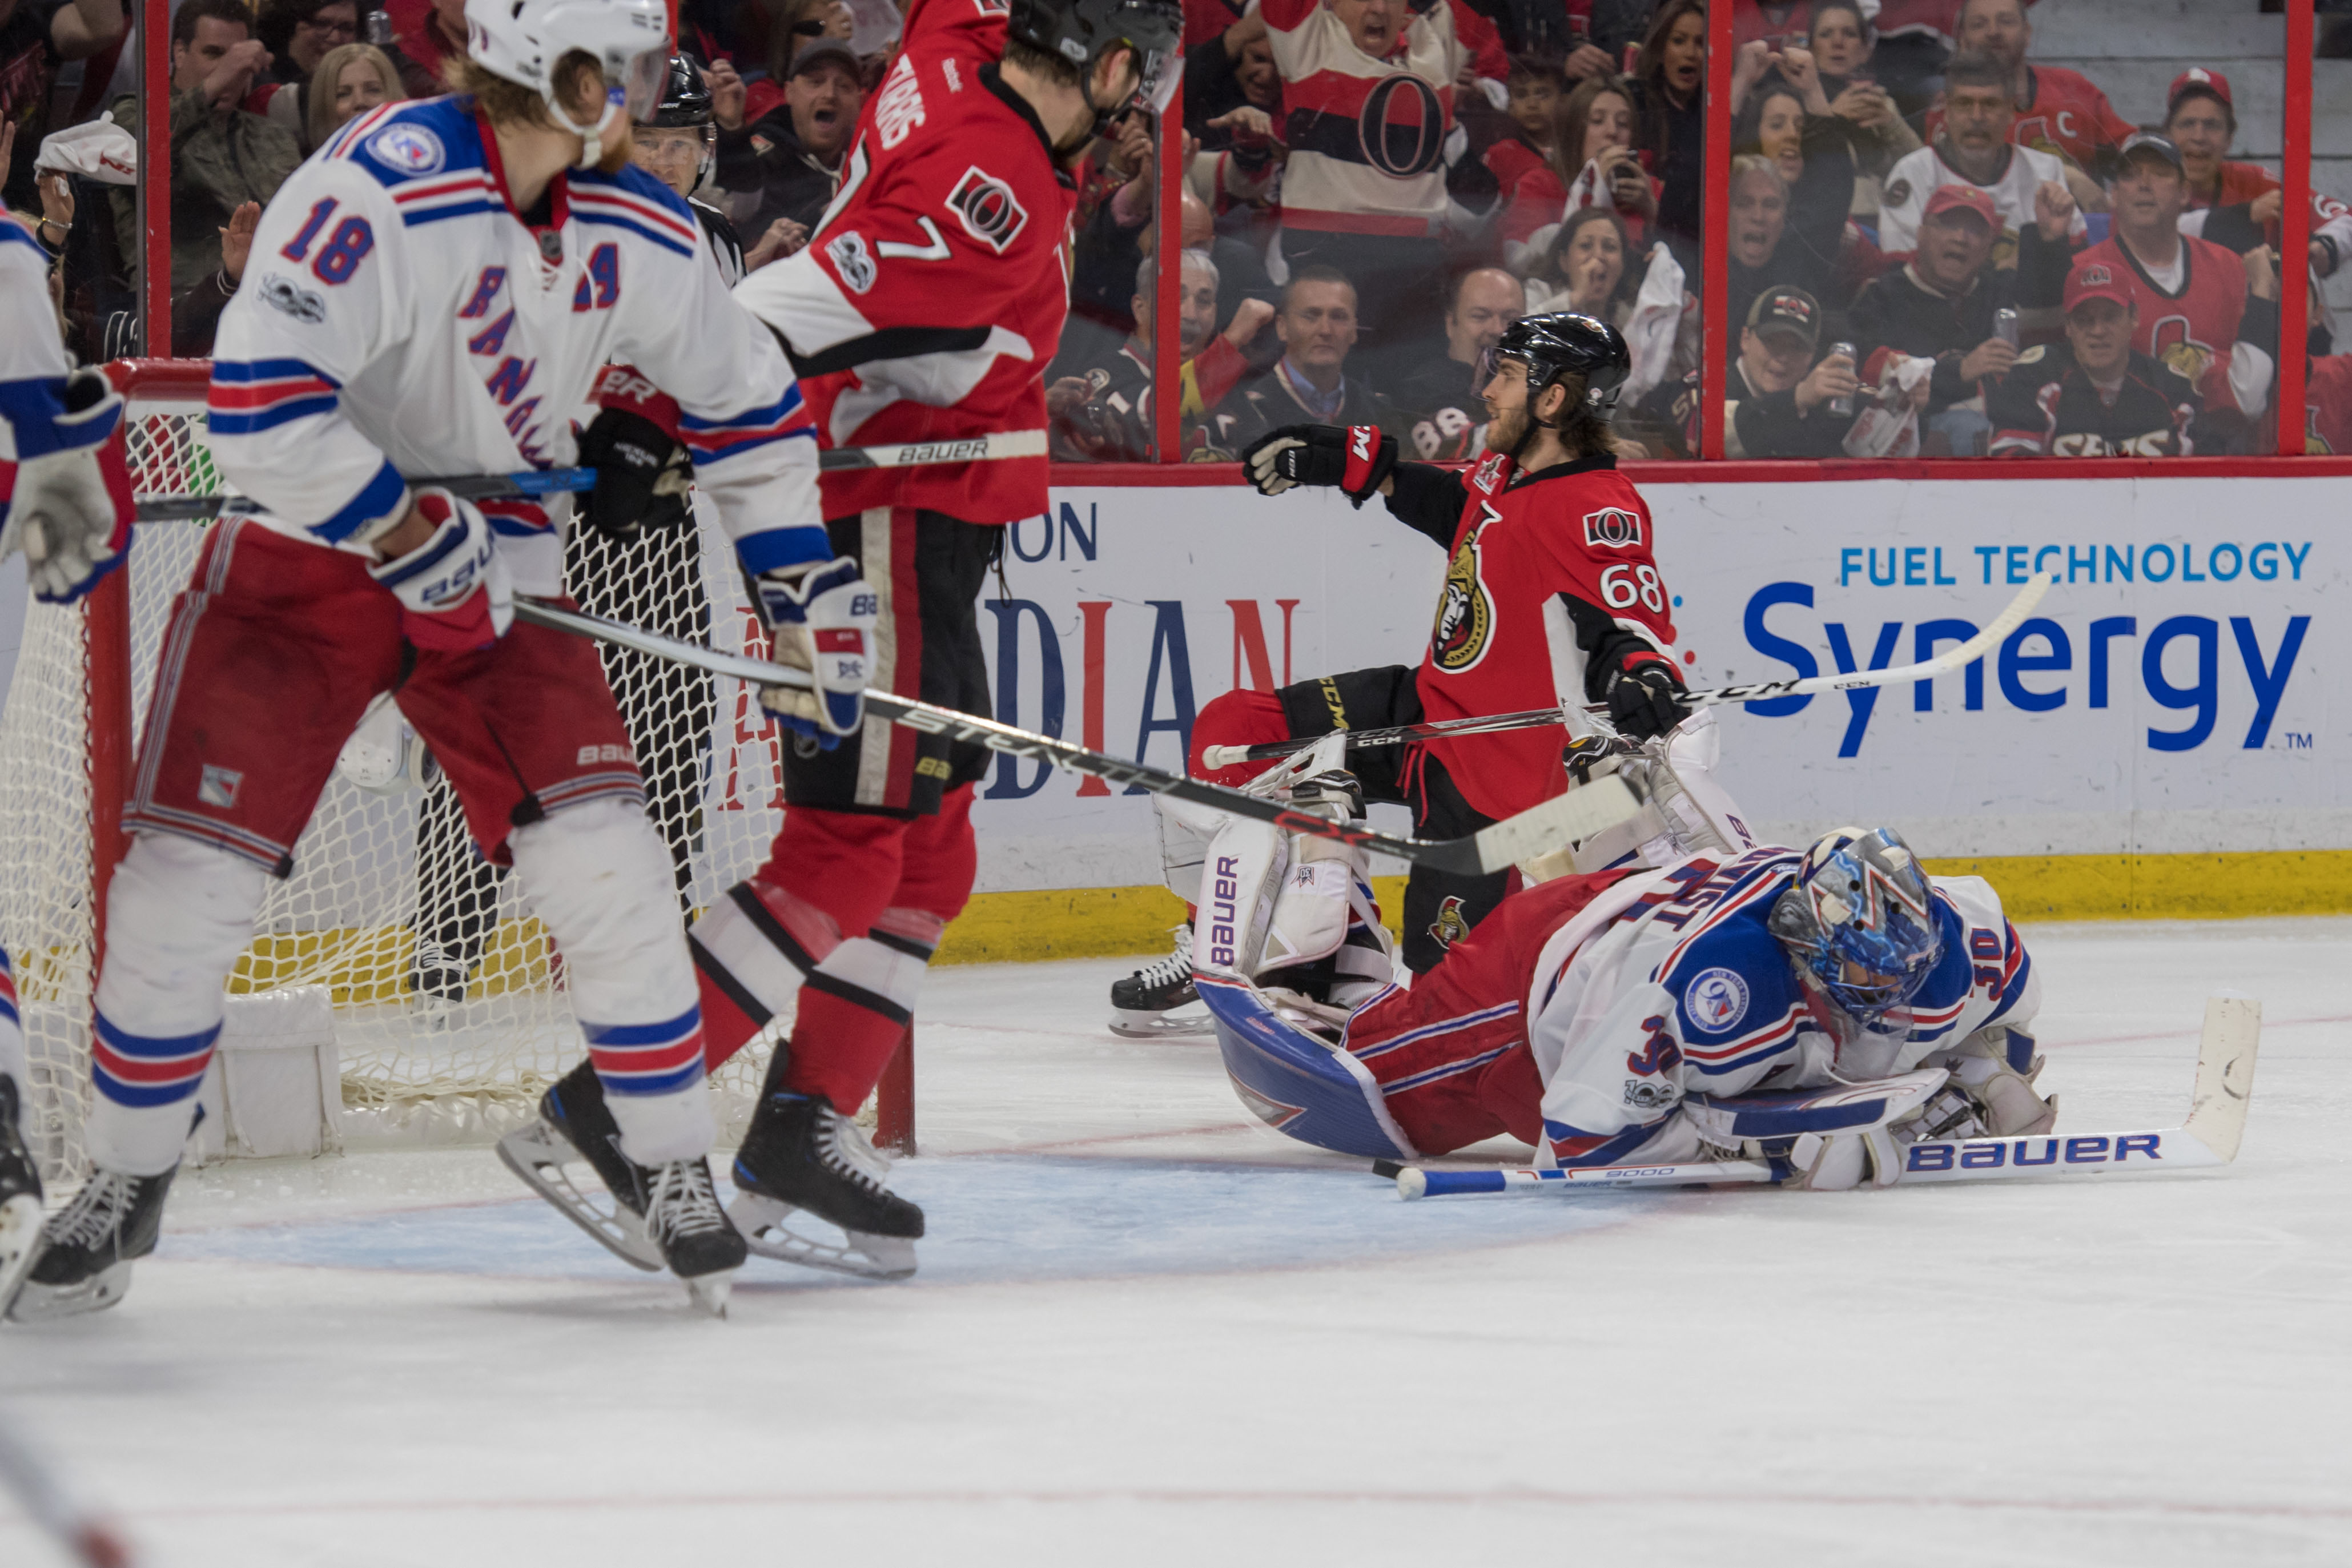 10045343-nhl-stanley-cup-playoffs-new-york-rangers-at-ottawa-senators